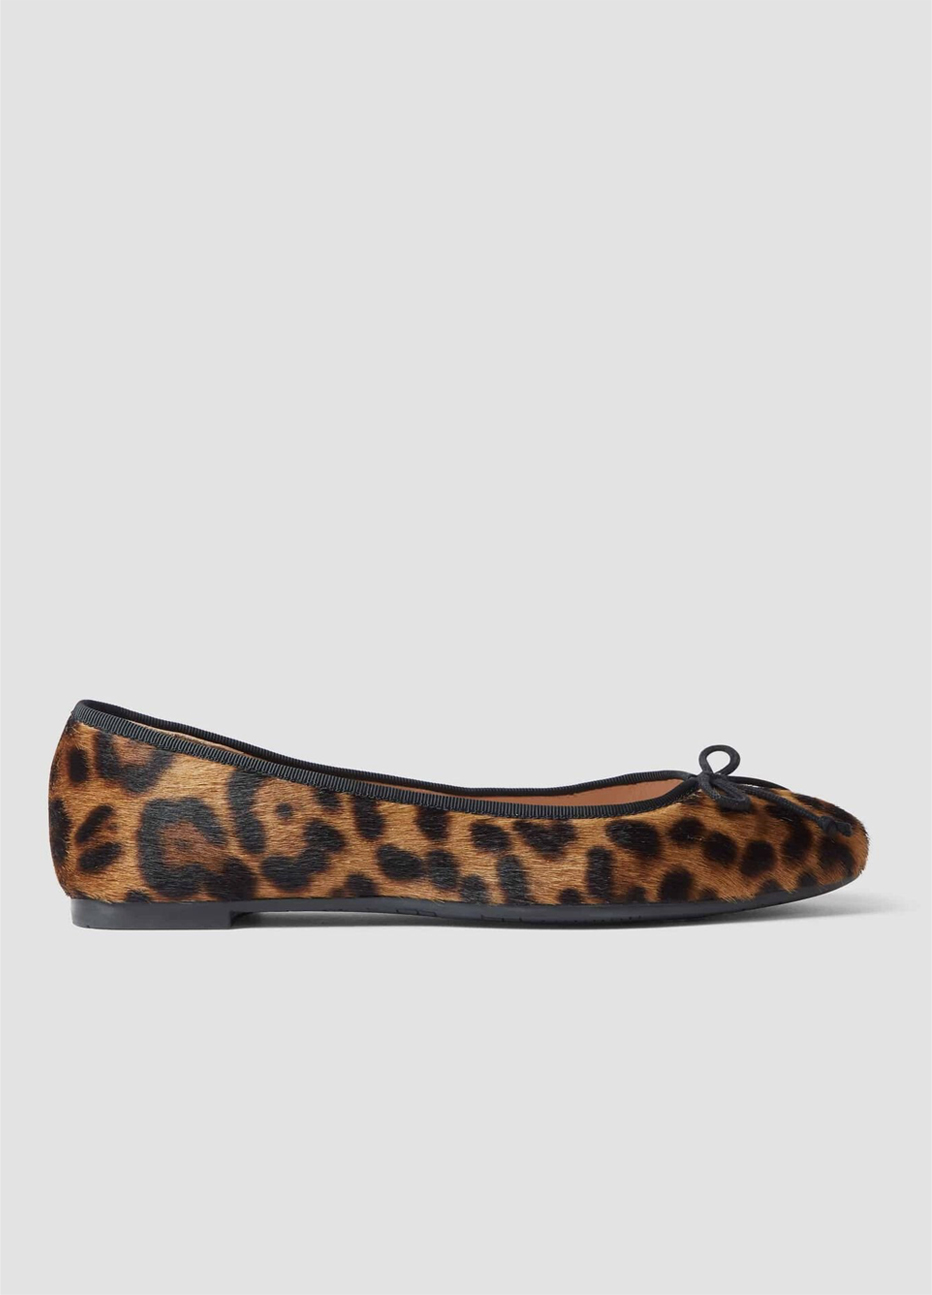 Hobbs ballerina flat with a leopard print.